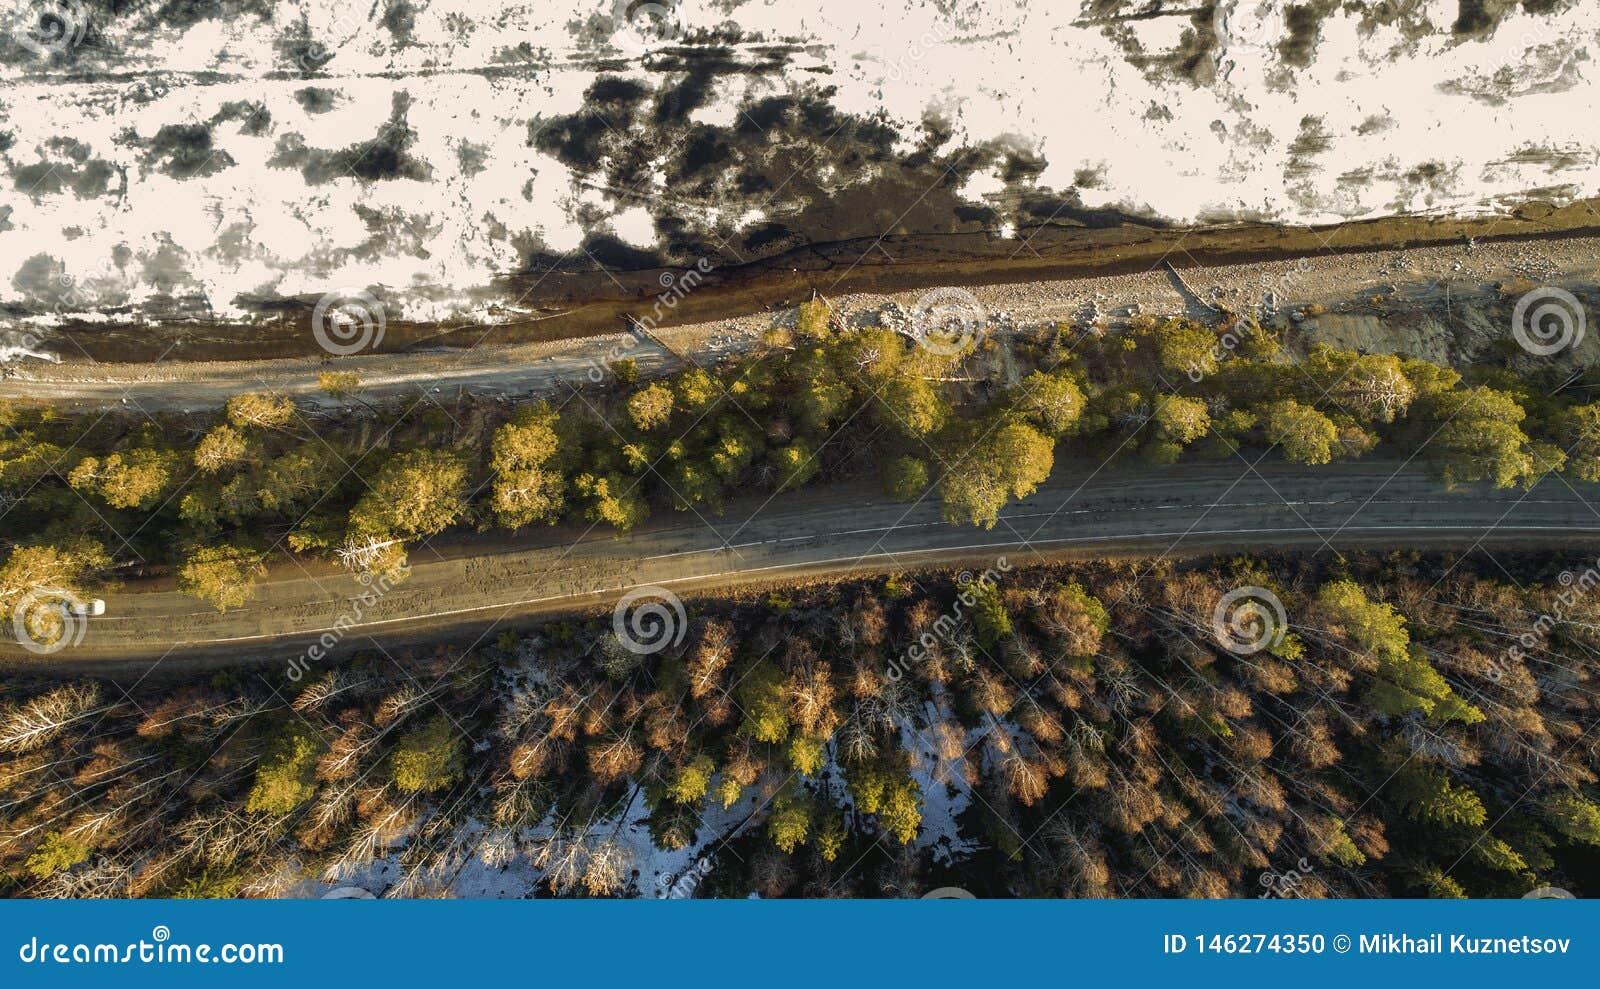 Vogelperspektive der Fr?hlingslandstra?e im Wald der gelben Kiefer mit schmelzendem Eissee